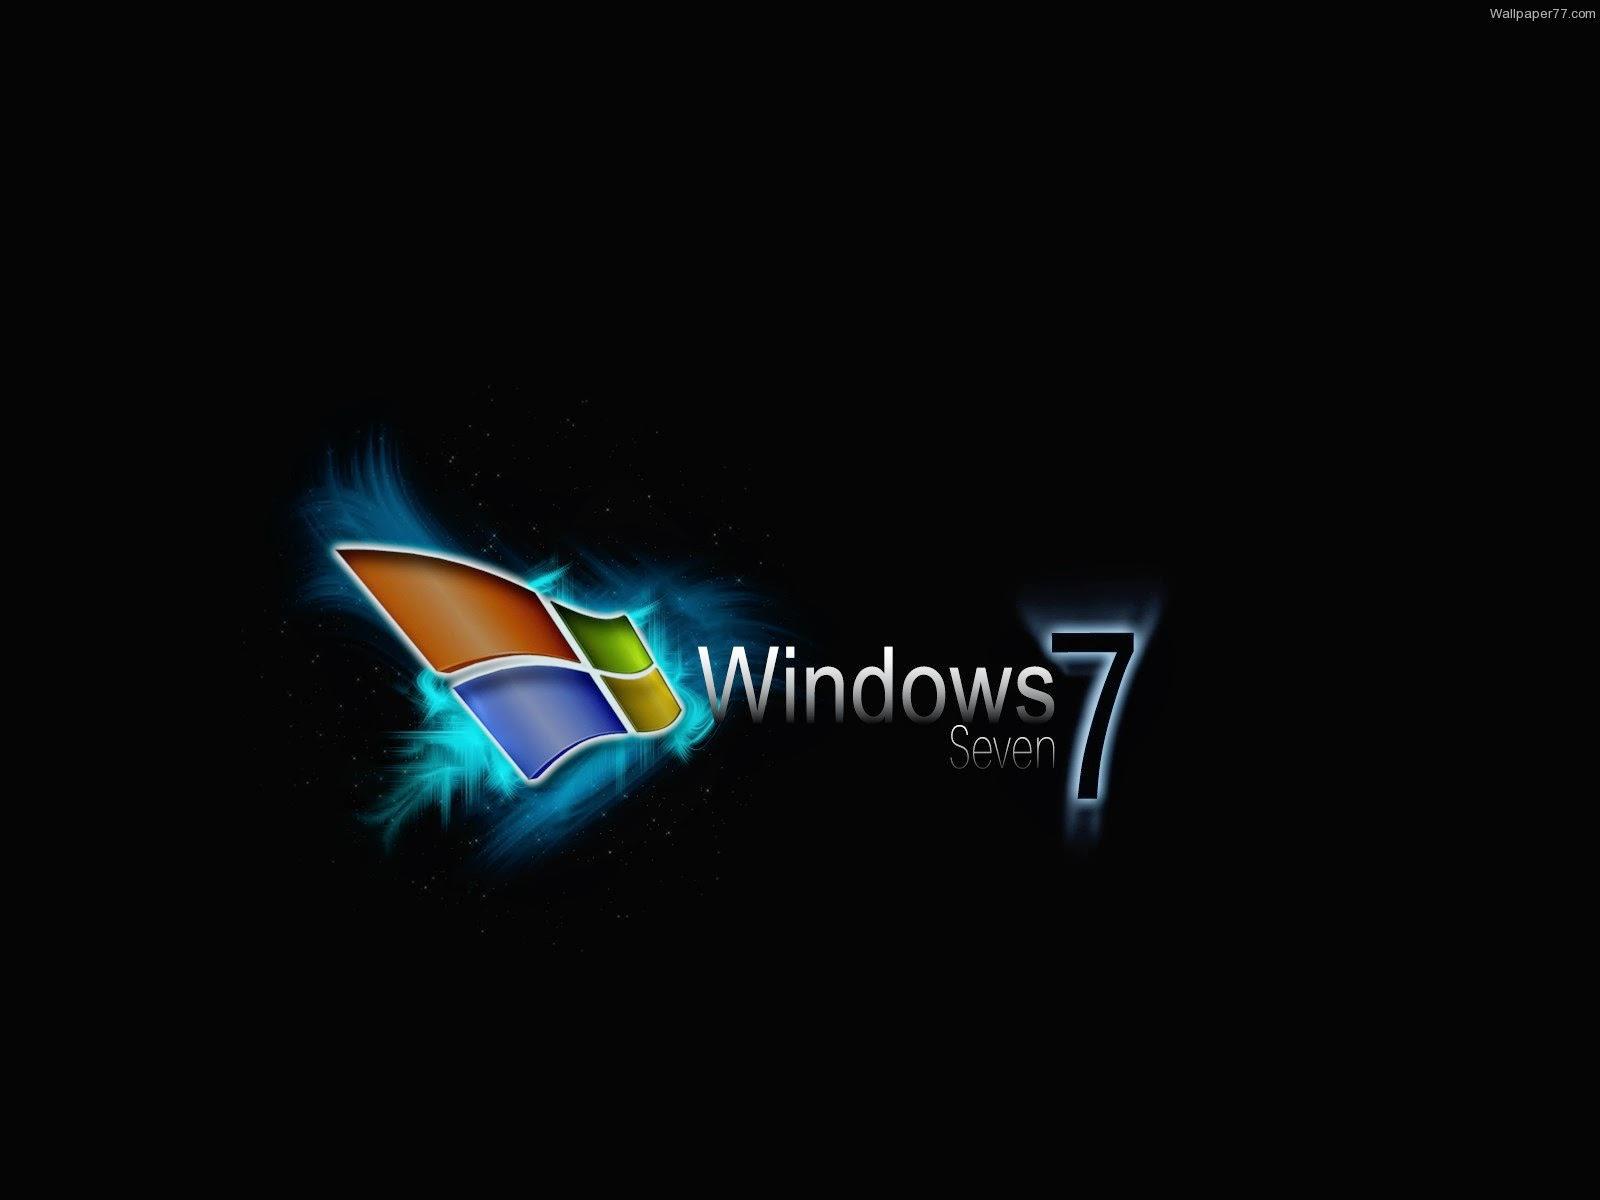 Windows 7 animated wallpaper wallpaper animated - Windows animated wallpaper ...